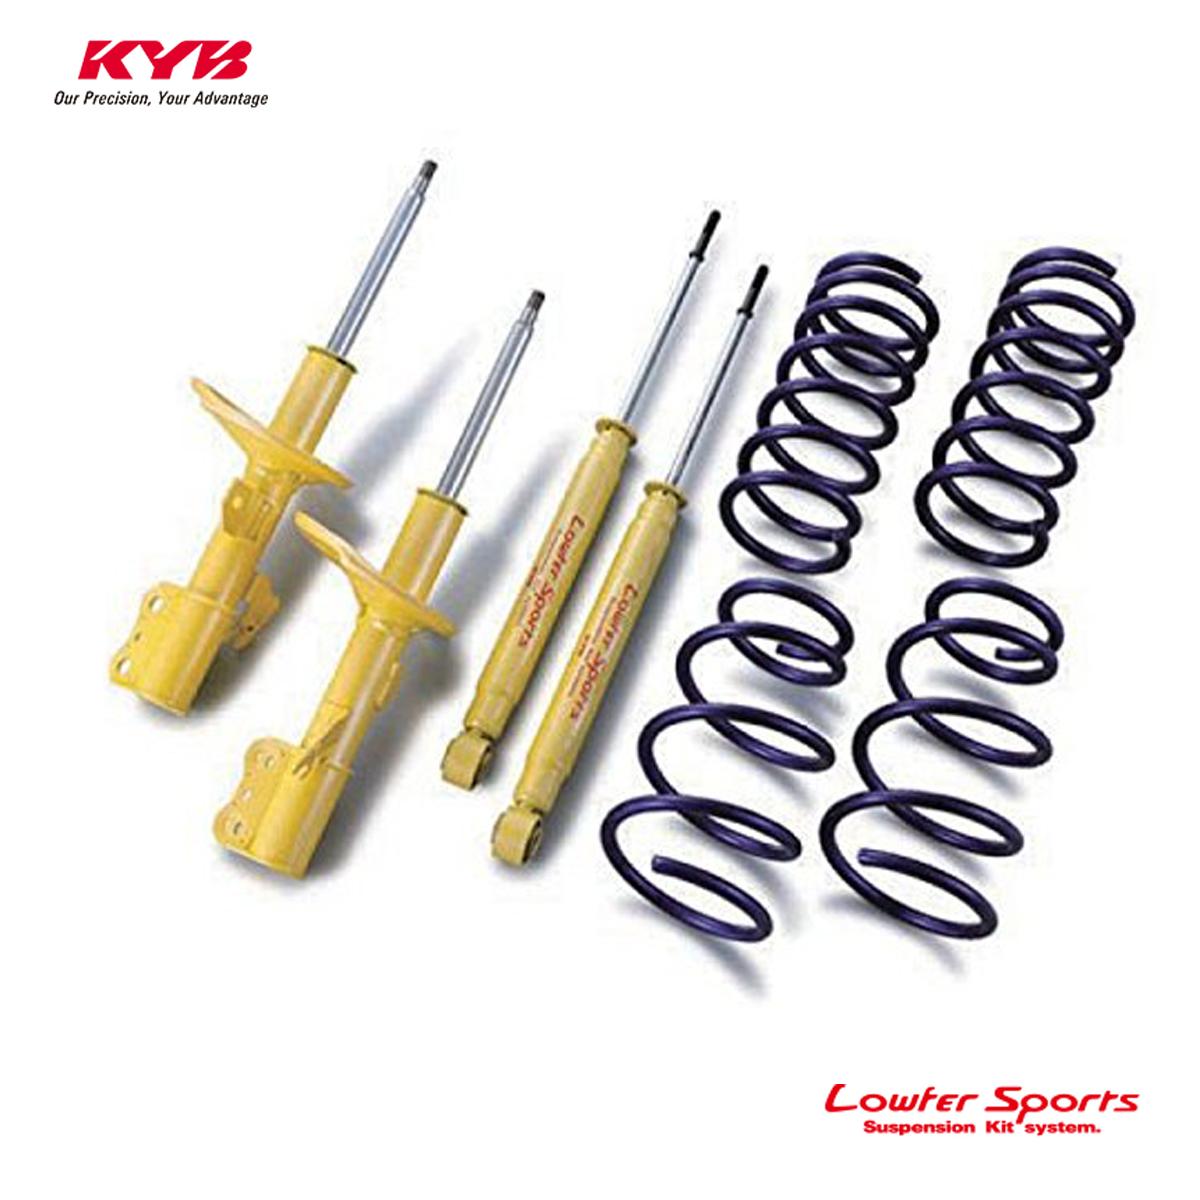 KYB カヤバ CX-3 CX3 DKEFW ショックアブソーバー サスペンションキット セット LOWFER SPORTS KIT LKIT-DKEFW 配送先条件有り